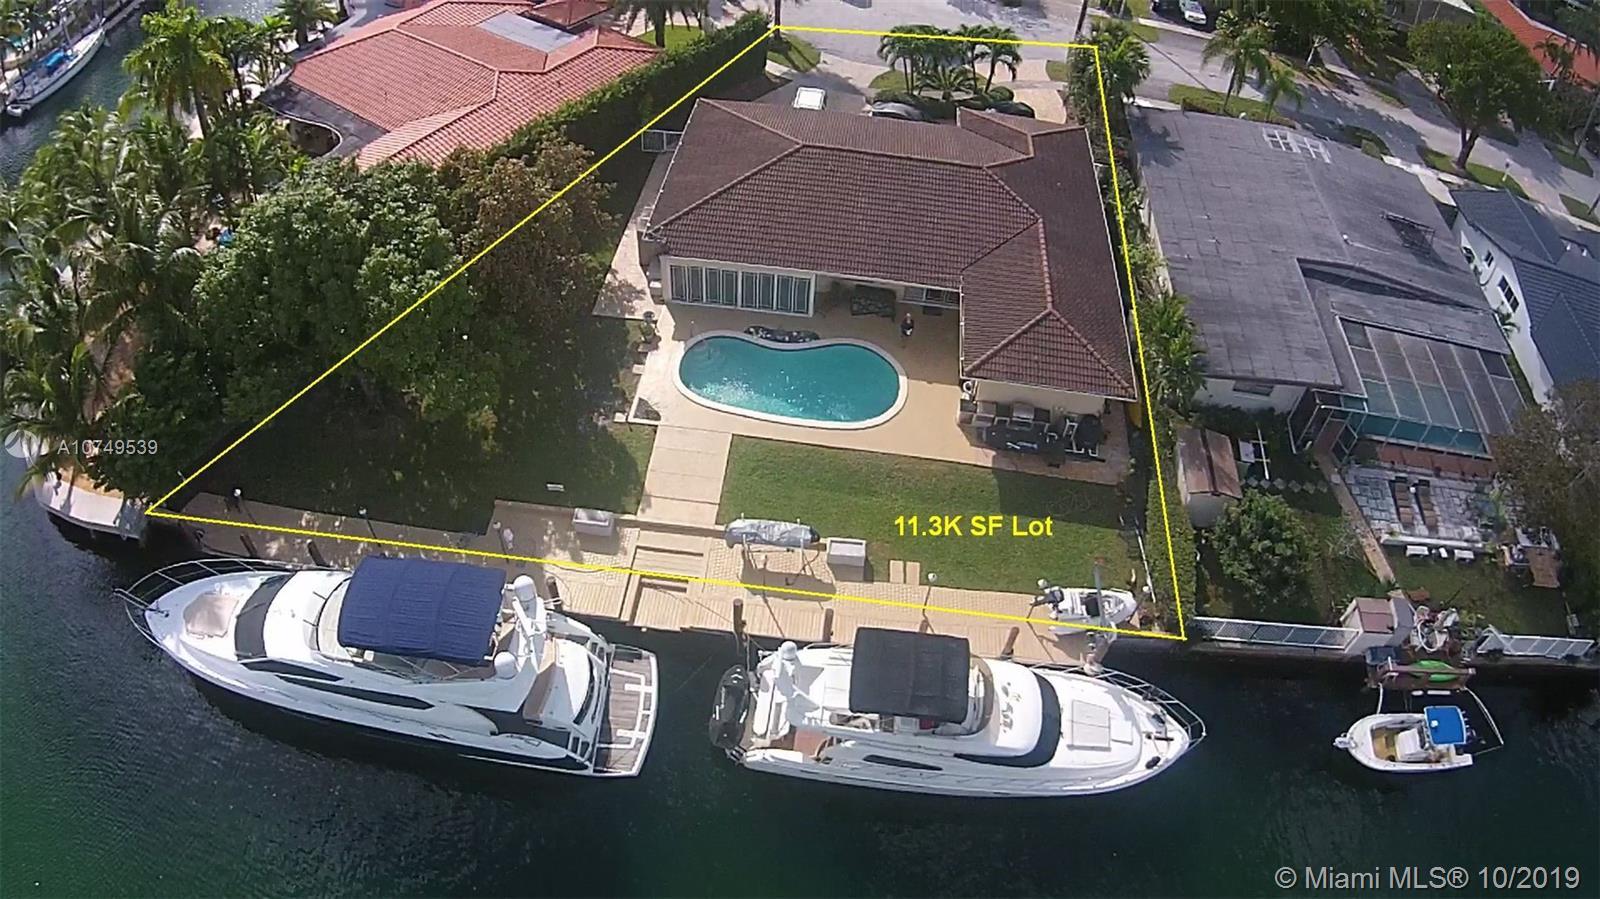 2405  Arch Creek Dr  For Sale A10749539, FL